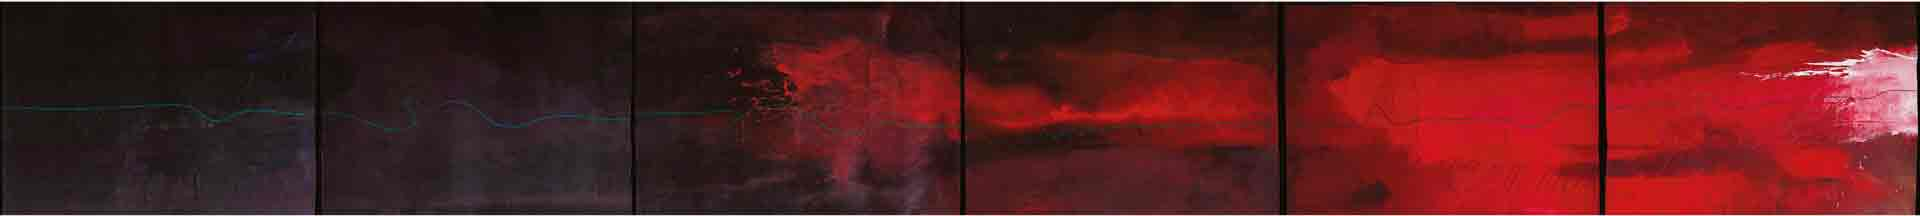 Dalva Duarte 24 Caprices - Abstract strip 04